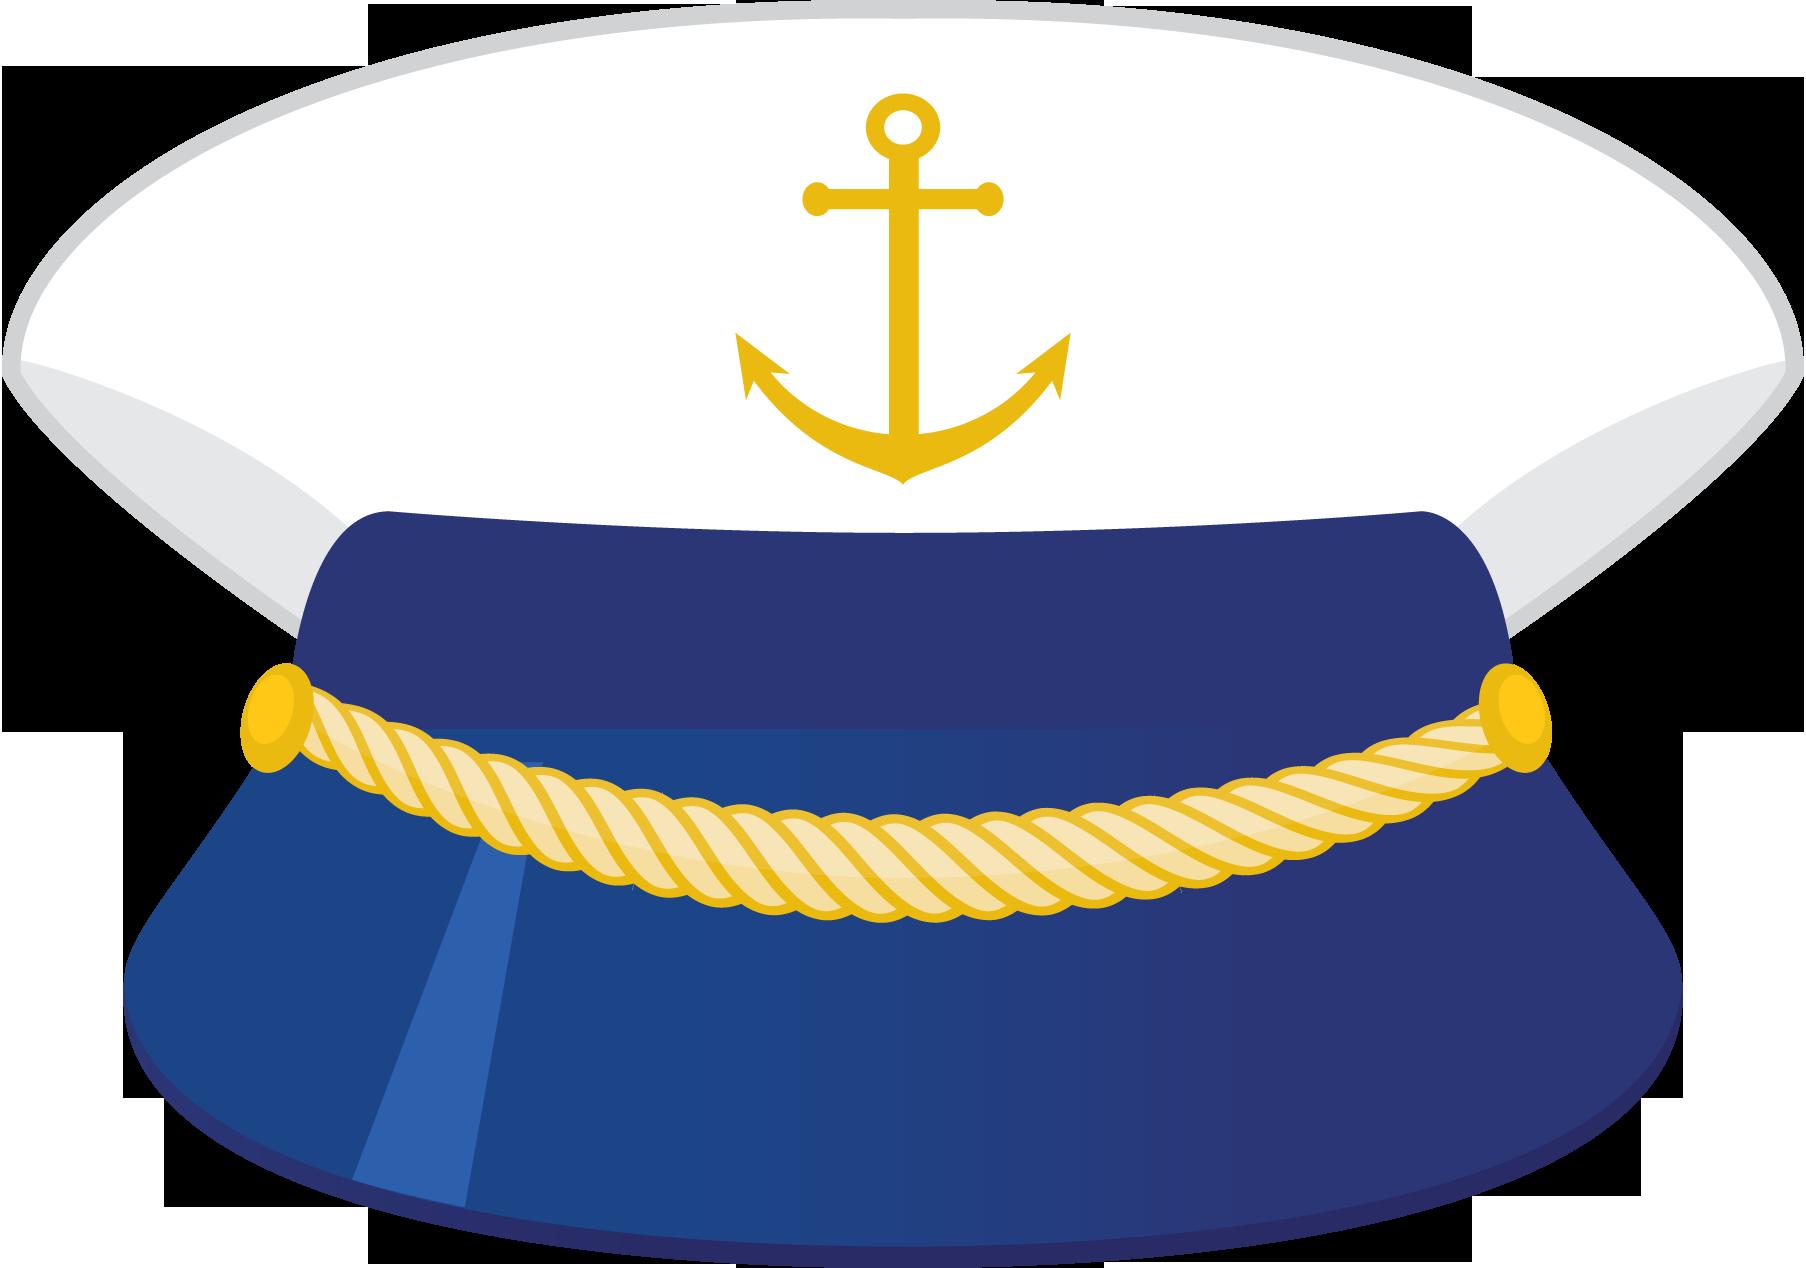 Captains n mo k. Nautical clipart hat